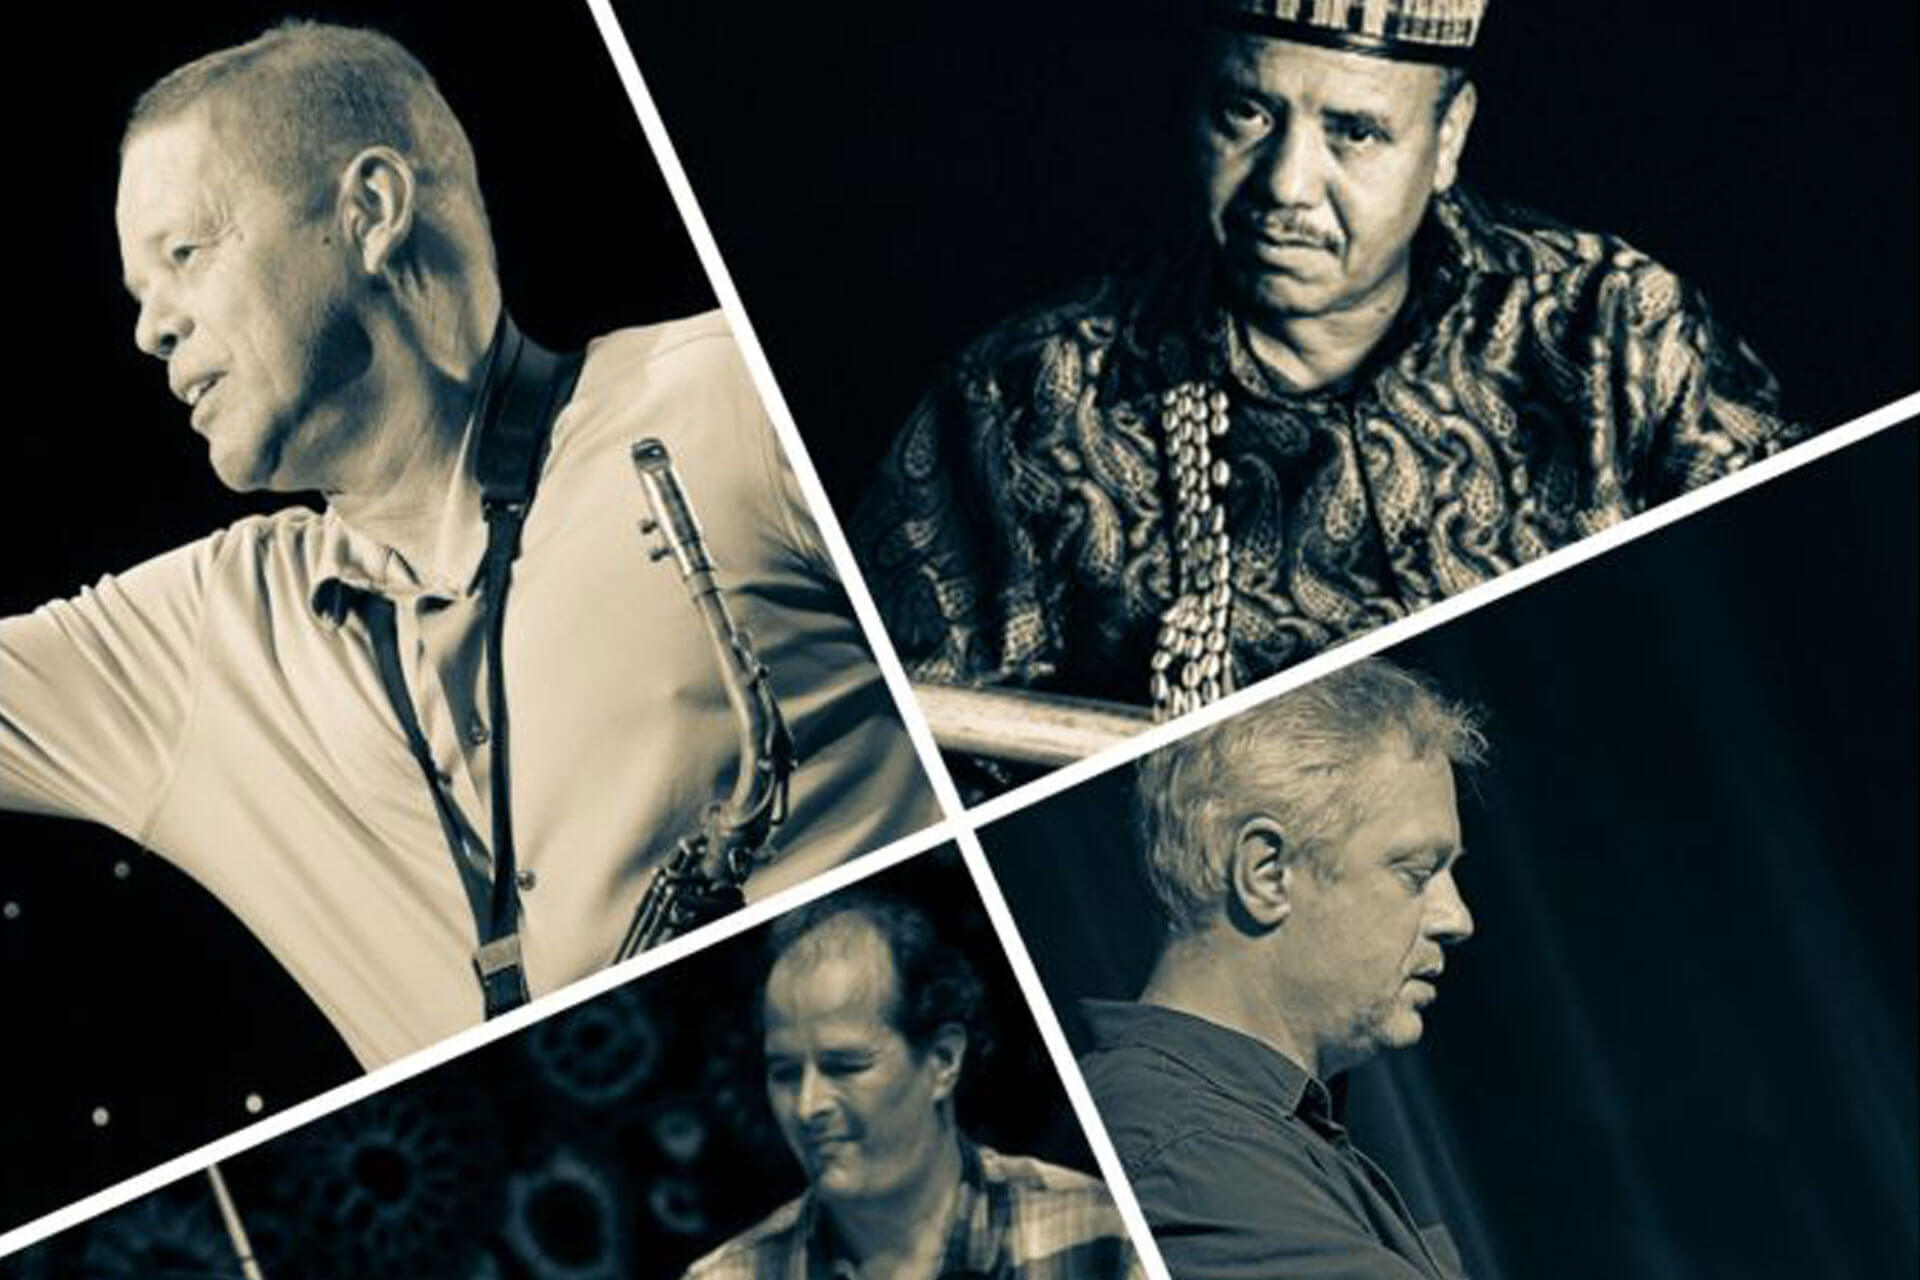 MAJID-BEKKAS-PAUL-VAN-KEMENADE-STEVKO-BUSCH-MARKKU-OUNASKARI-treden-op-het-Red-Light-Jazz-festival-in-Amsterdam